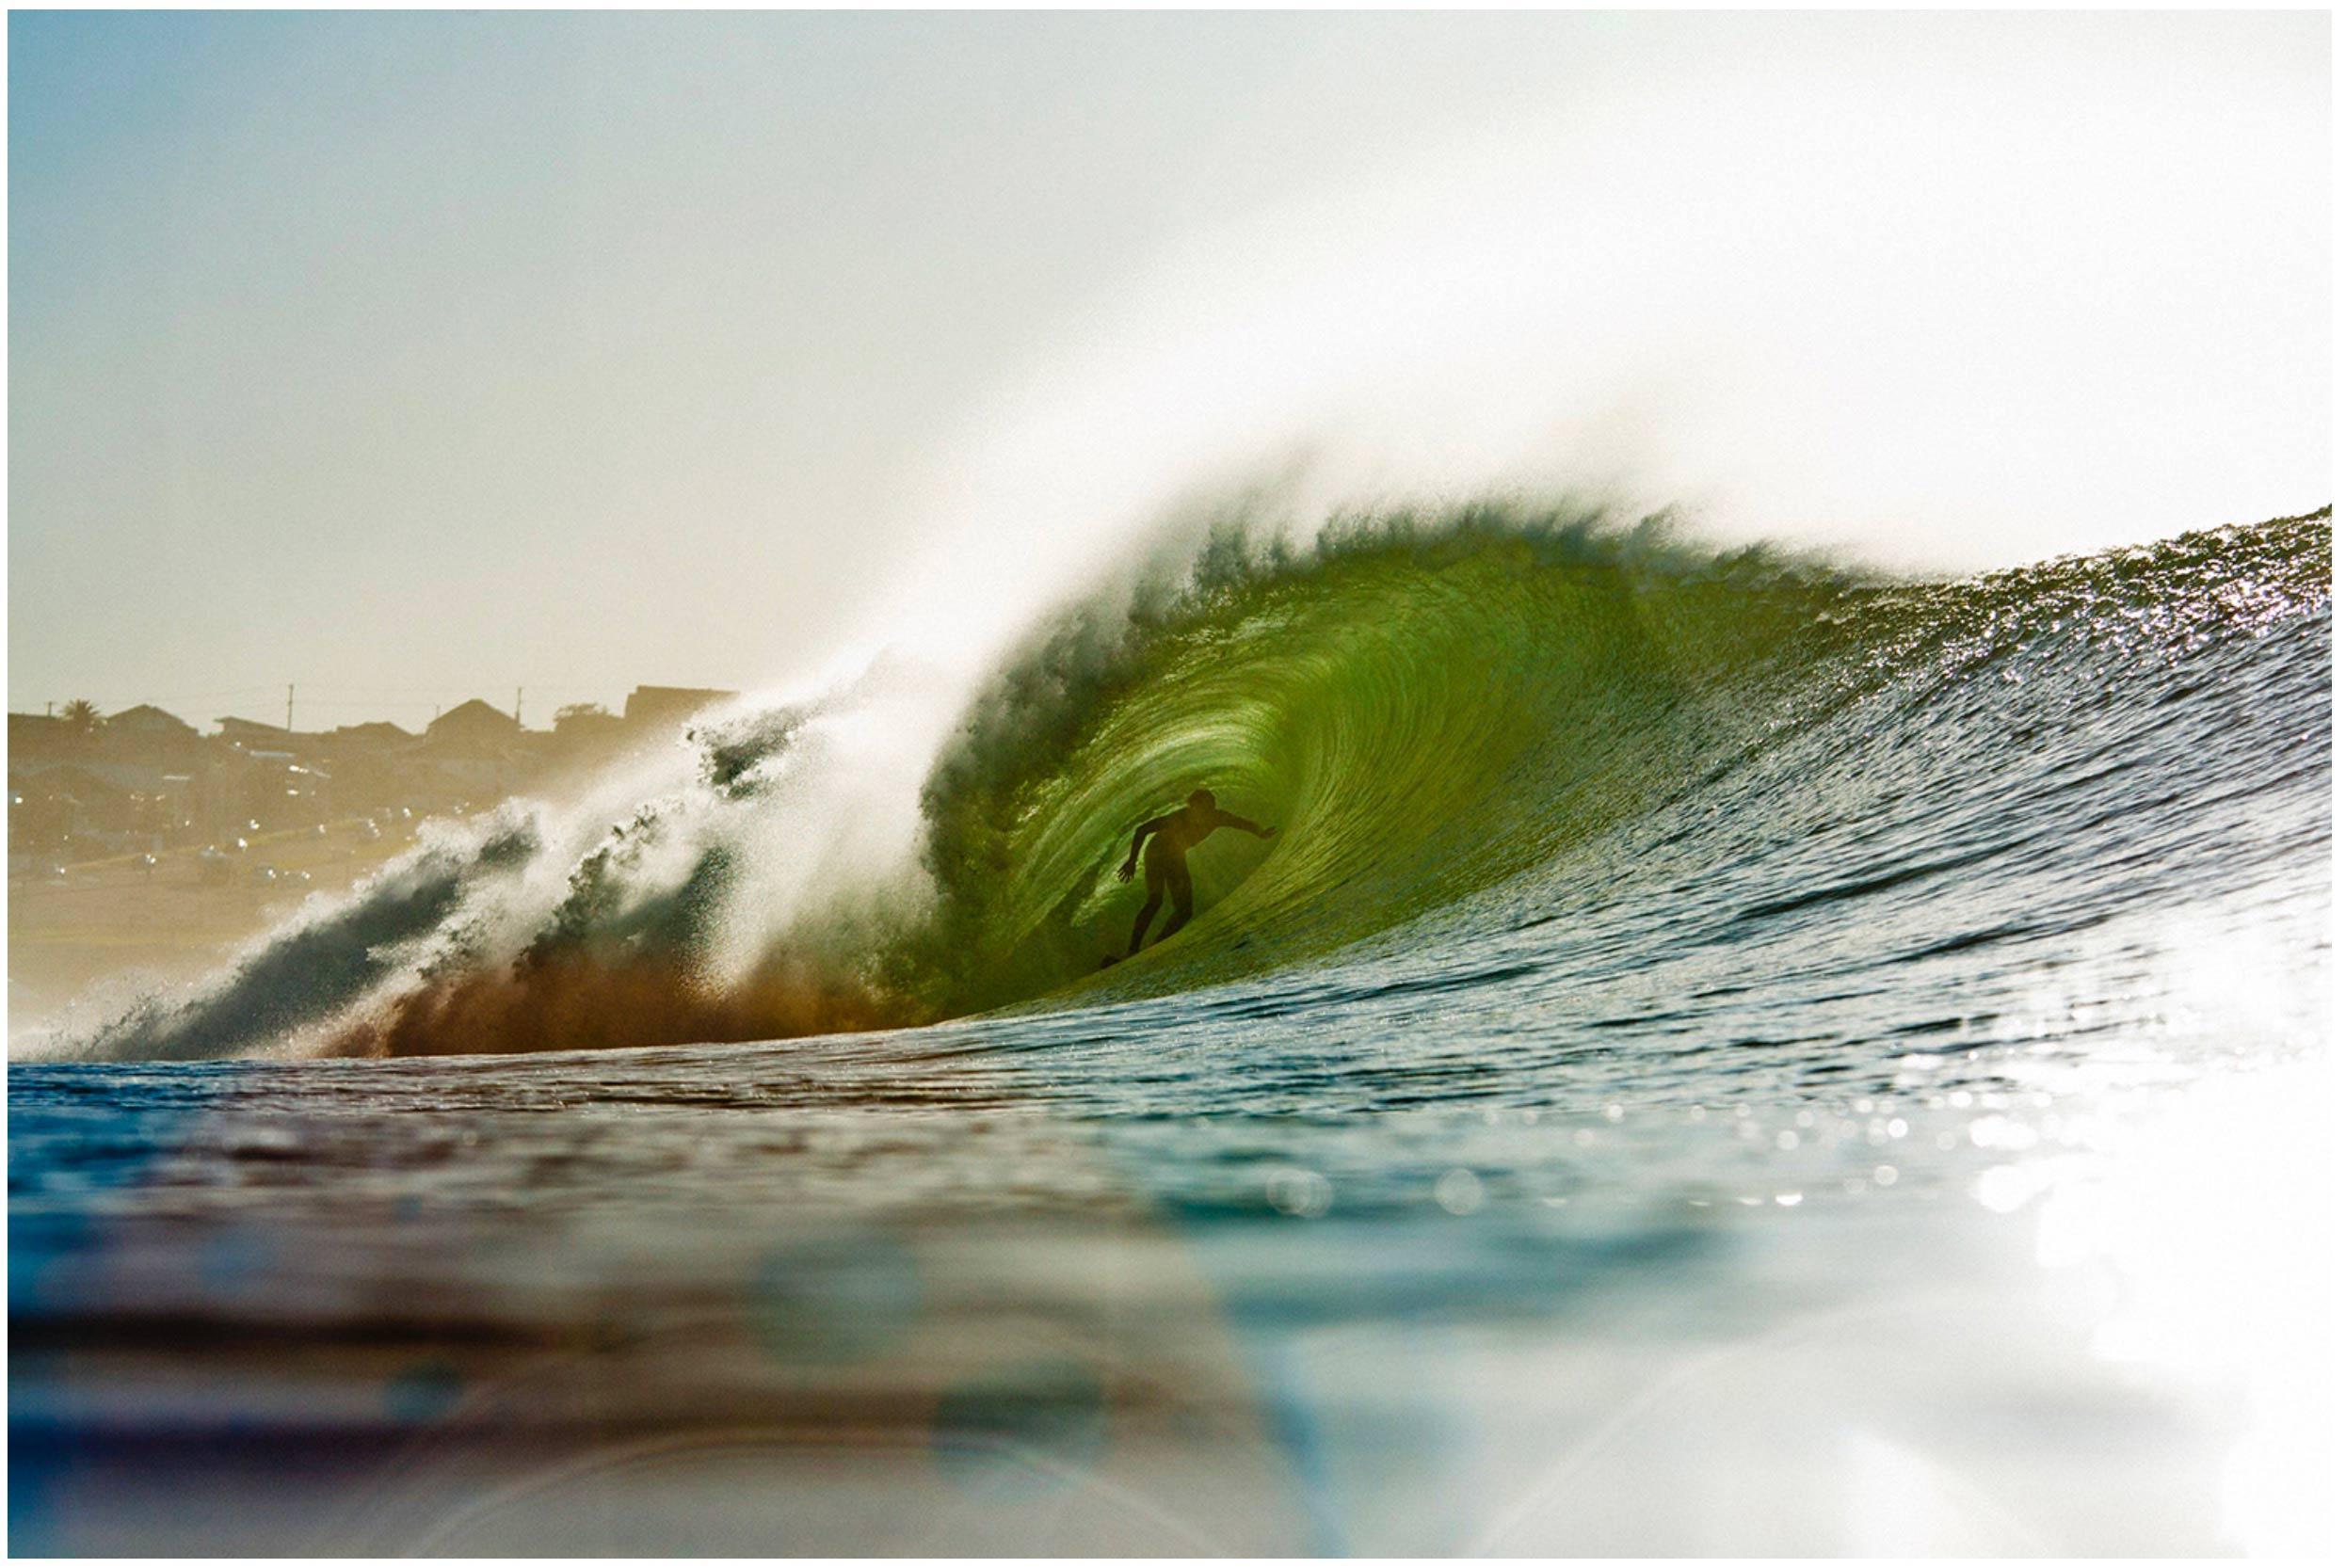 rodd-owen-surf-photography-for-sale-owenphoto-277.jpg